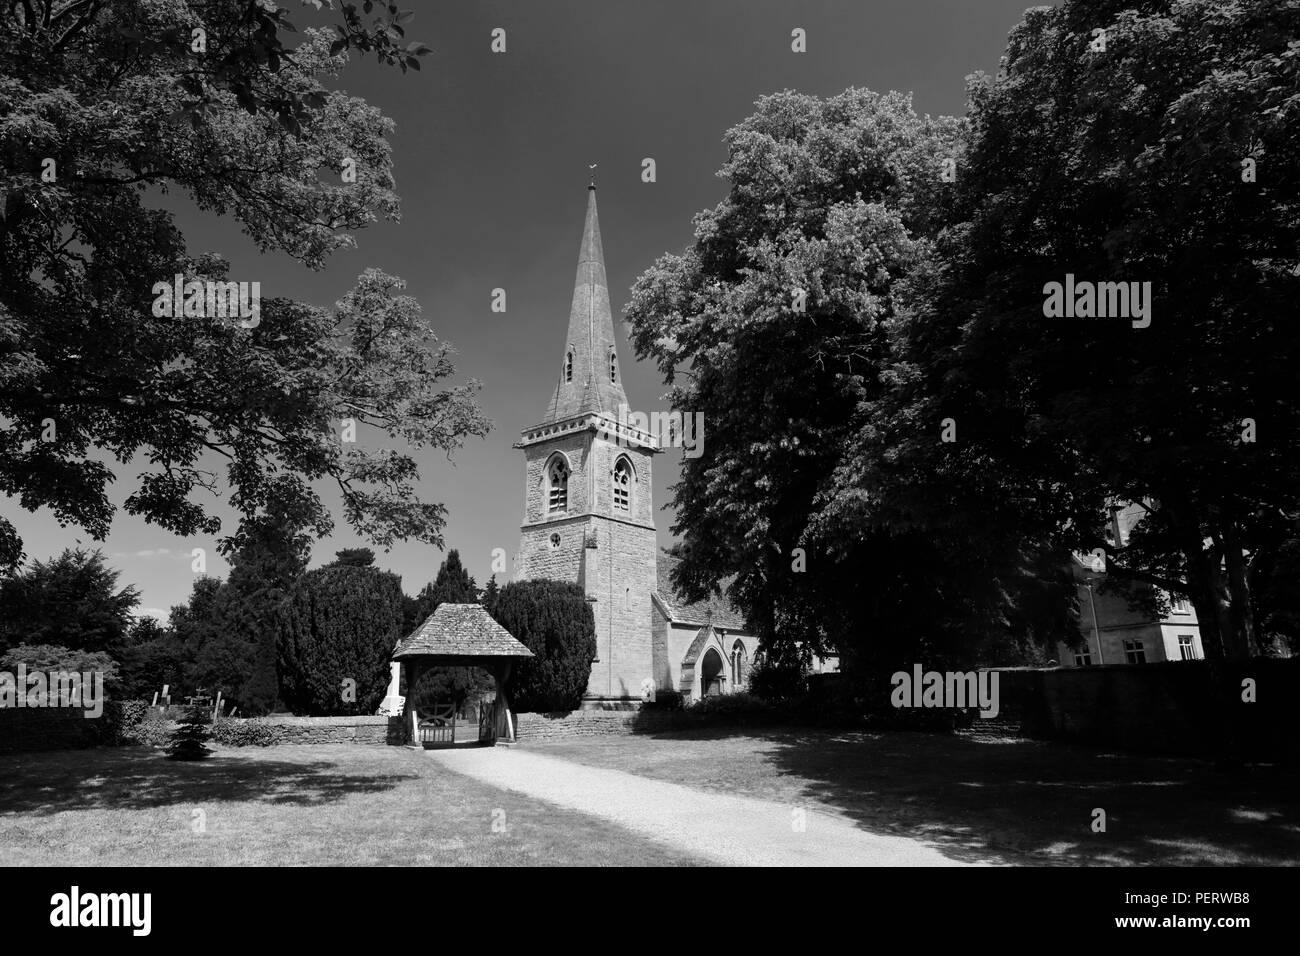 St Marys Church, Lower Slaughter village, Gloucestershire Cotswolds, England, UK - Stock Image